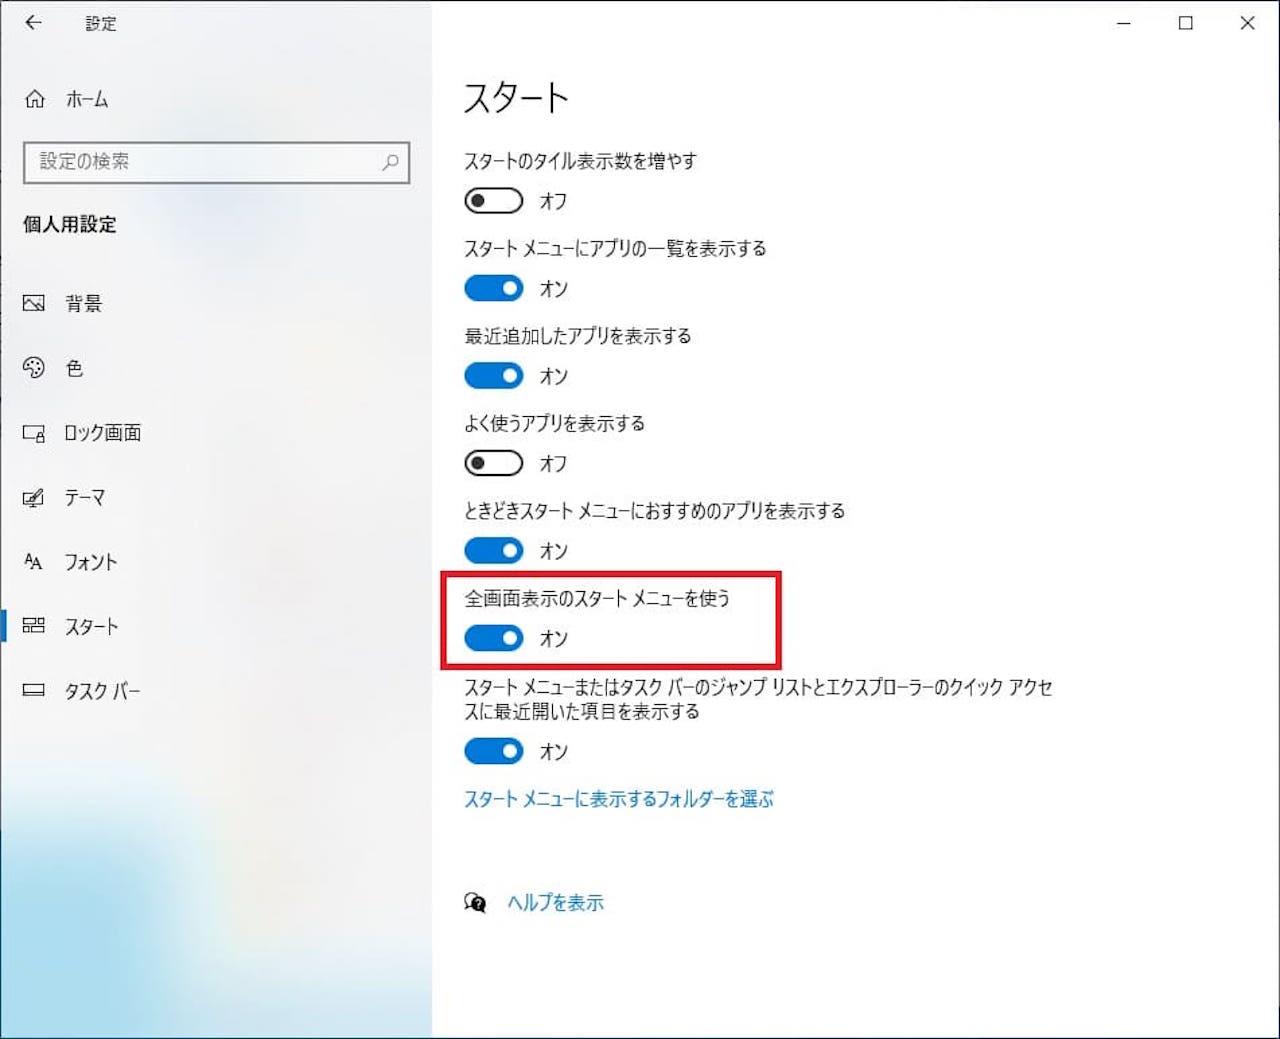 Windows10でスタートメニューの全画面表示を解除する方法⑤